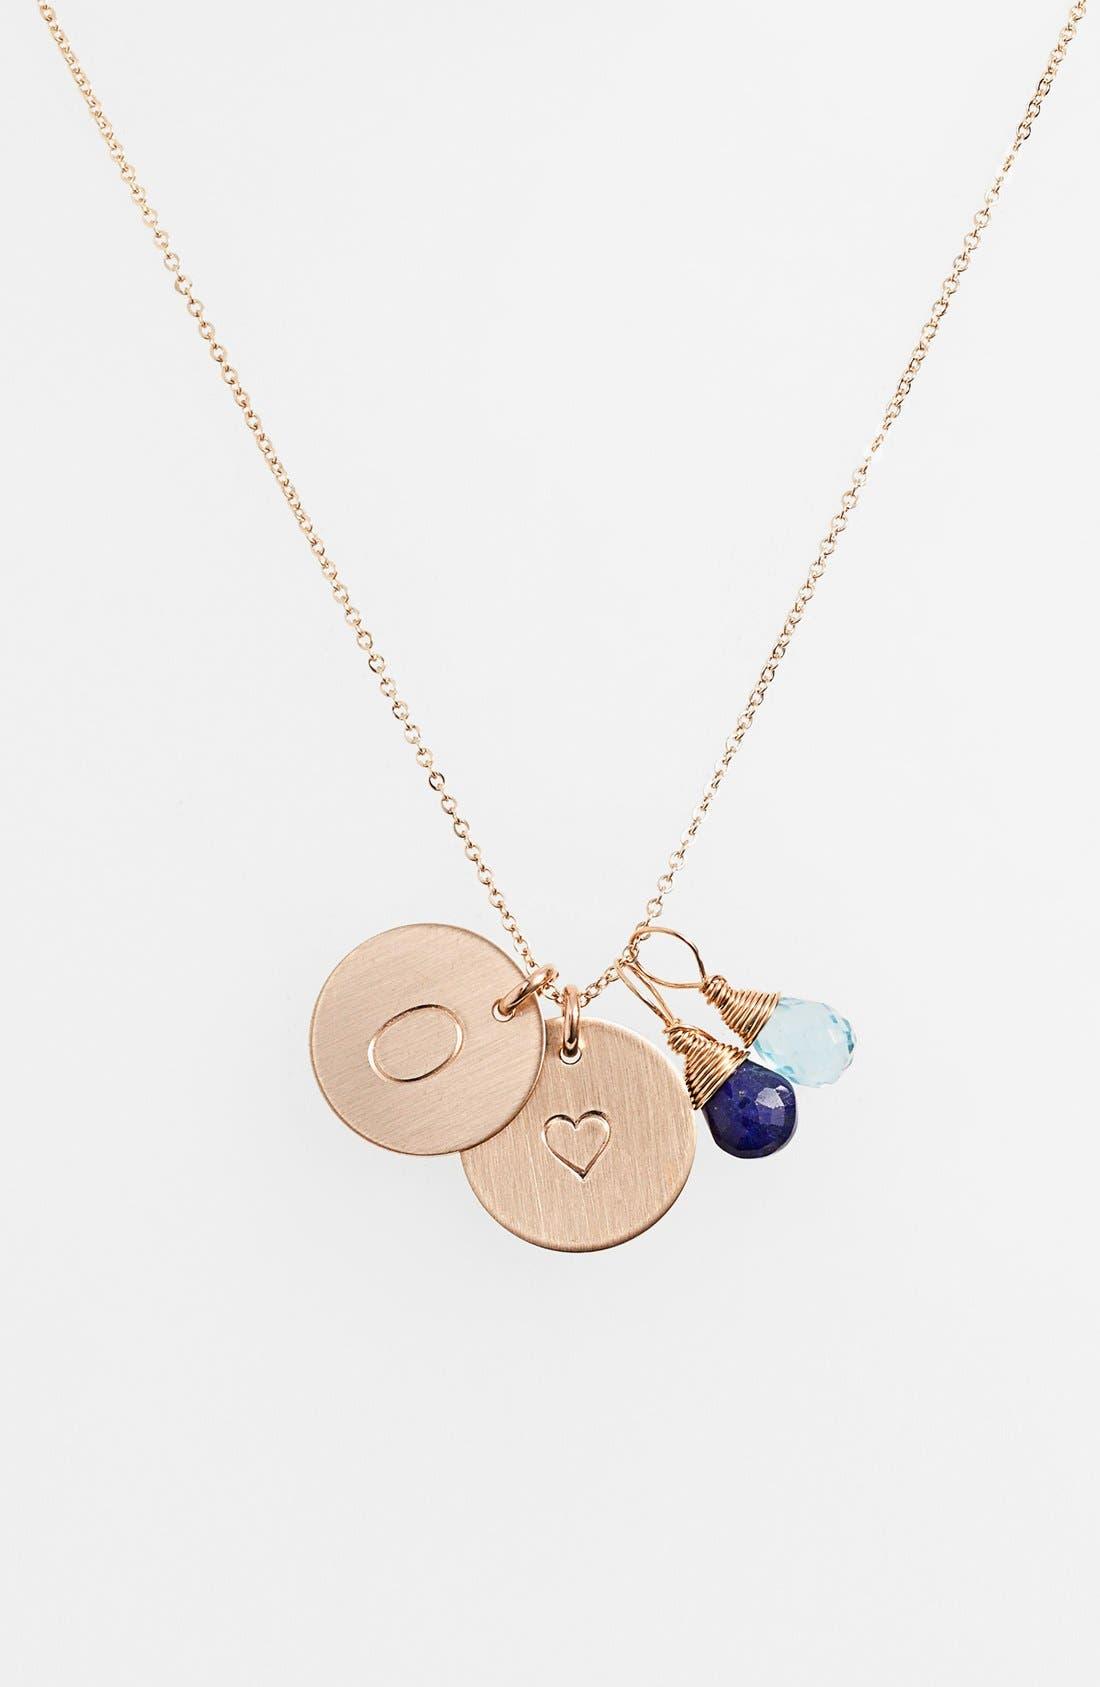 Blue Quartz Initial & Heart 14k-Gold Fill Disc Necklace,                         Main,                         color, Royal Blue And Ocean Blue O